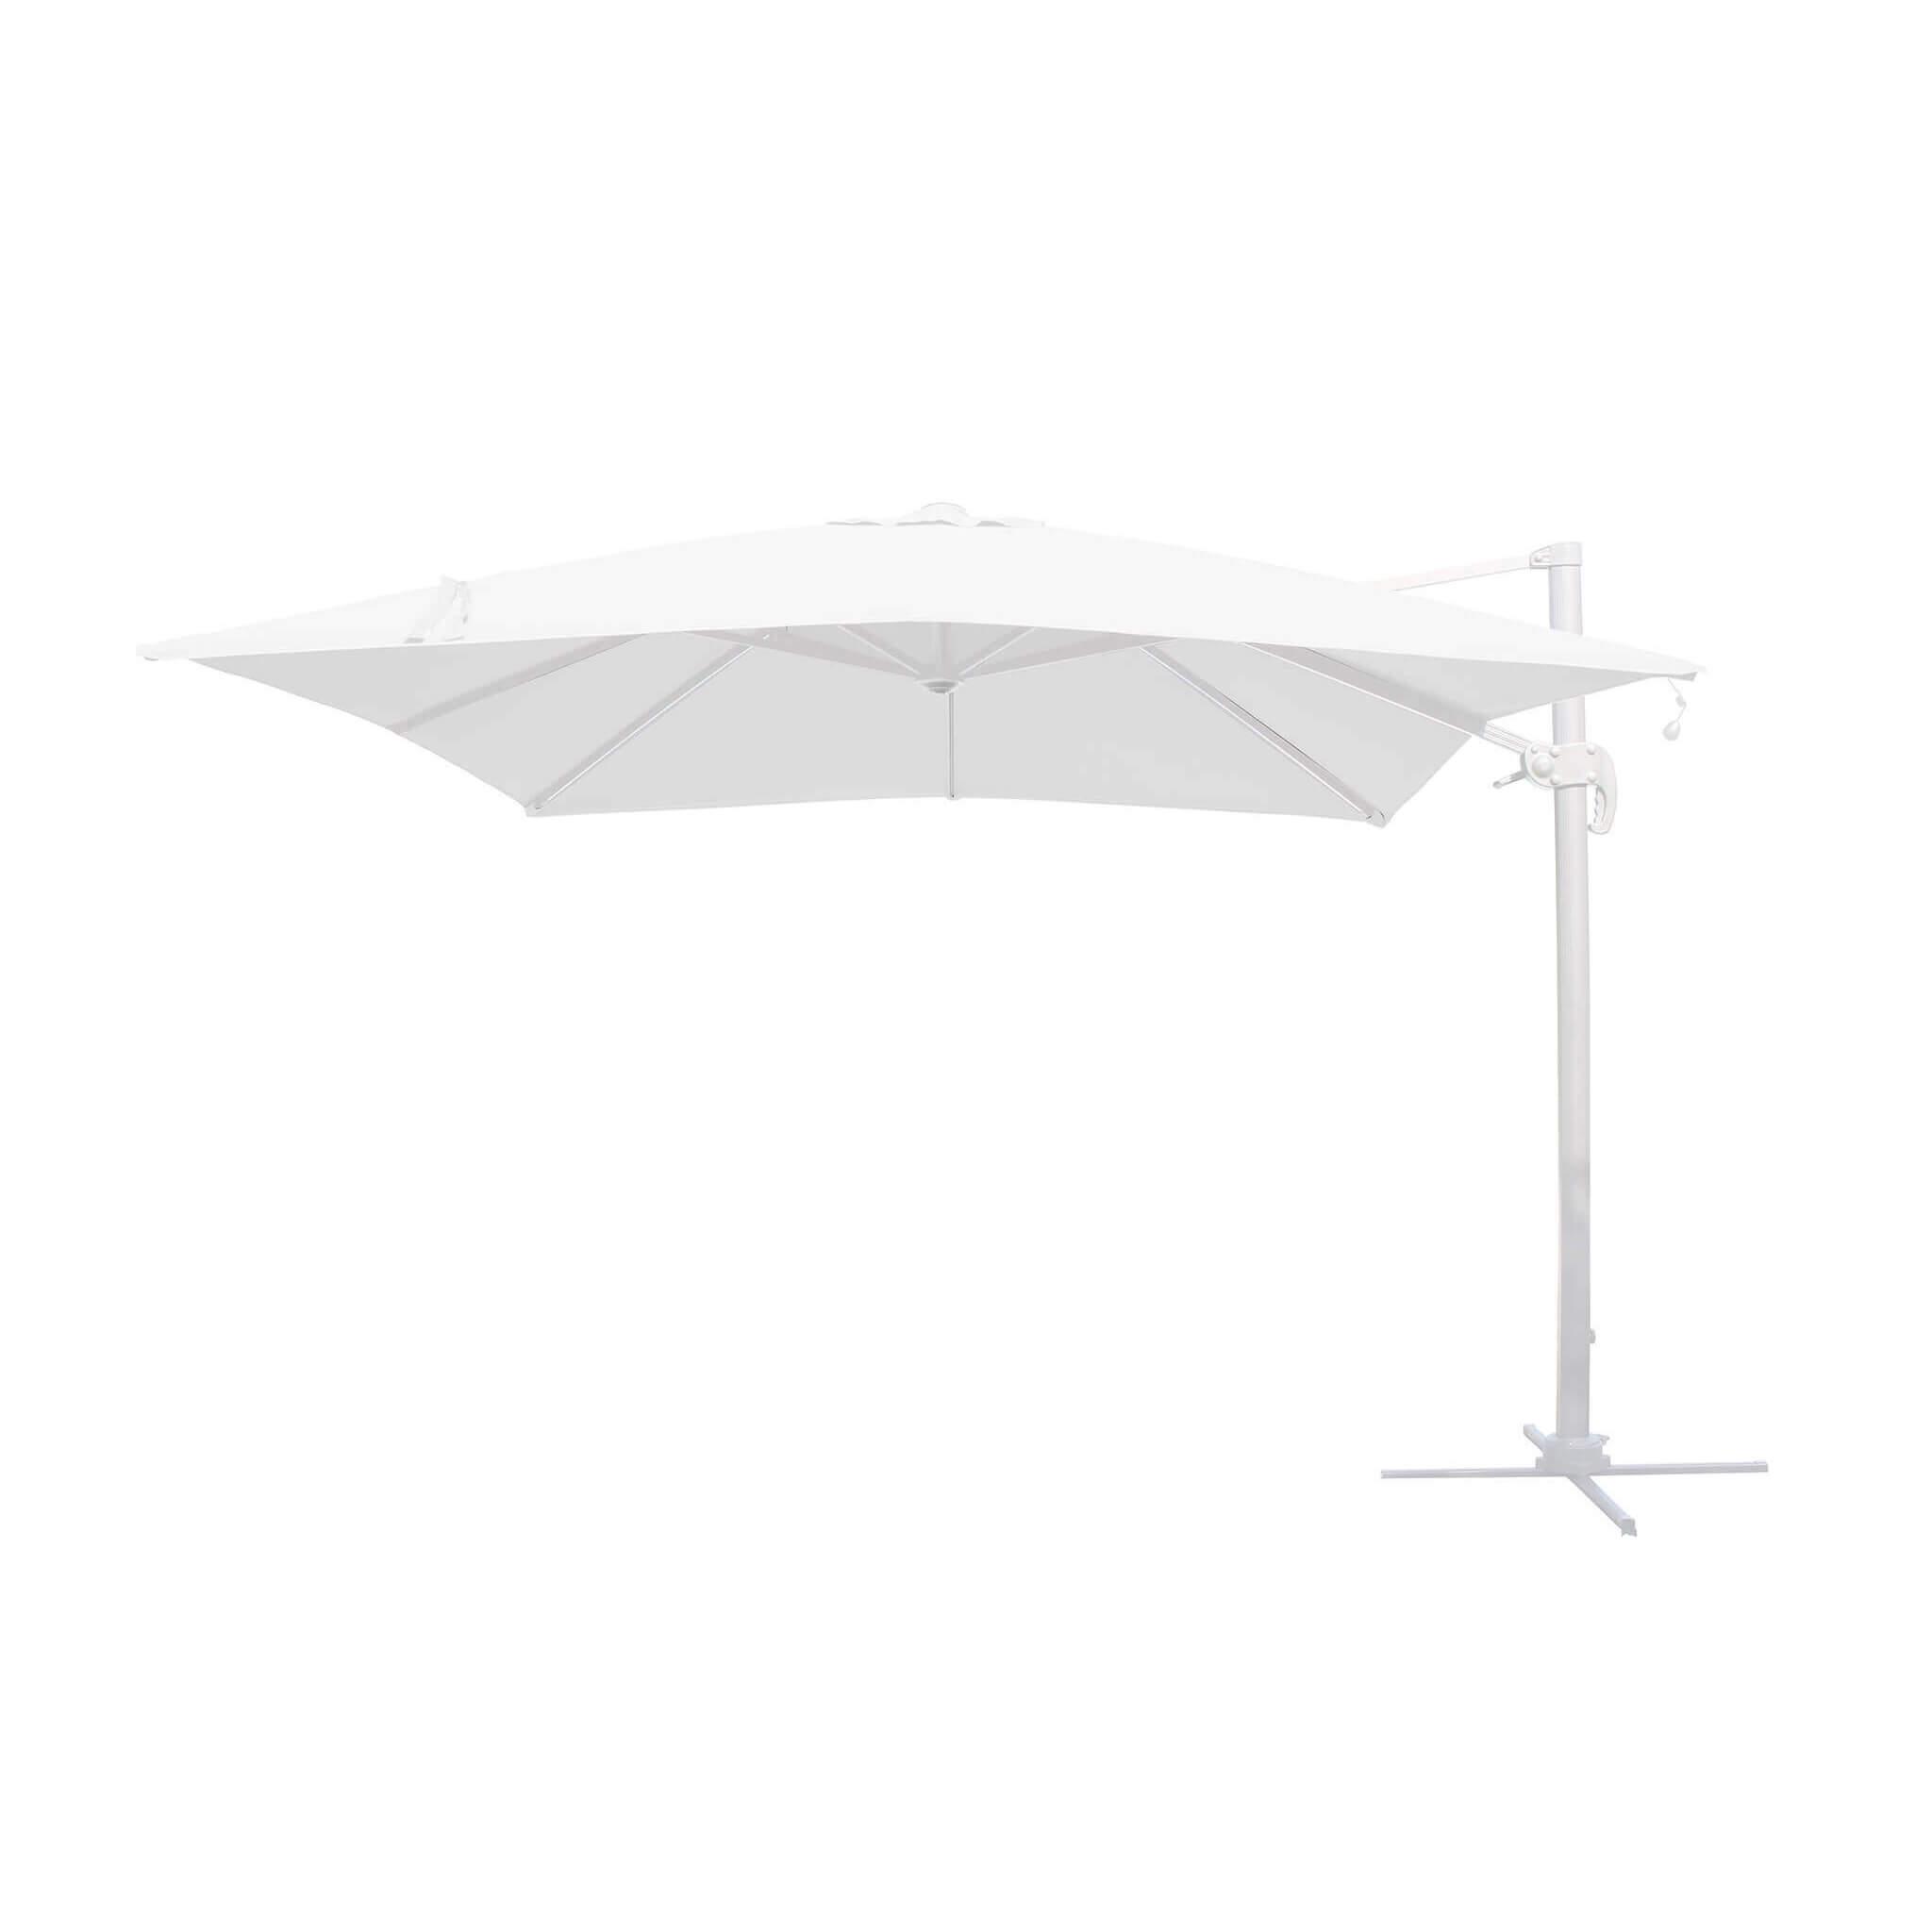 Milani Home TESLA - ombrellone da giardino decentrato con led 3 X 3